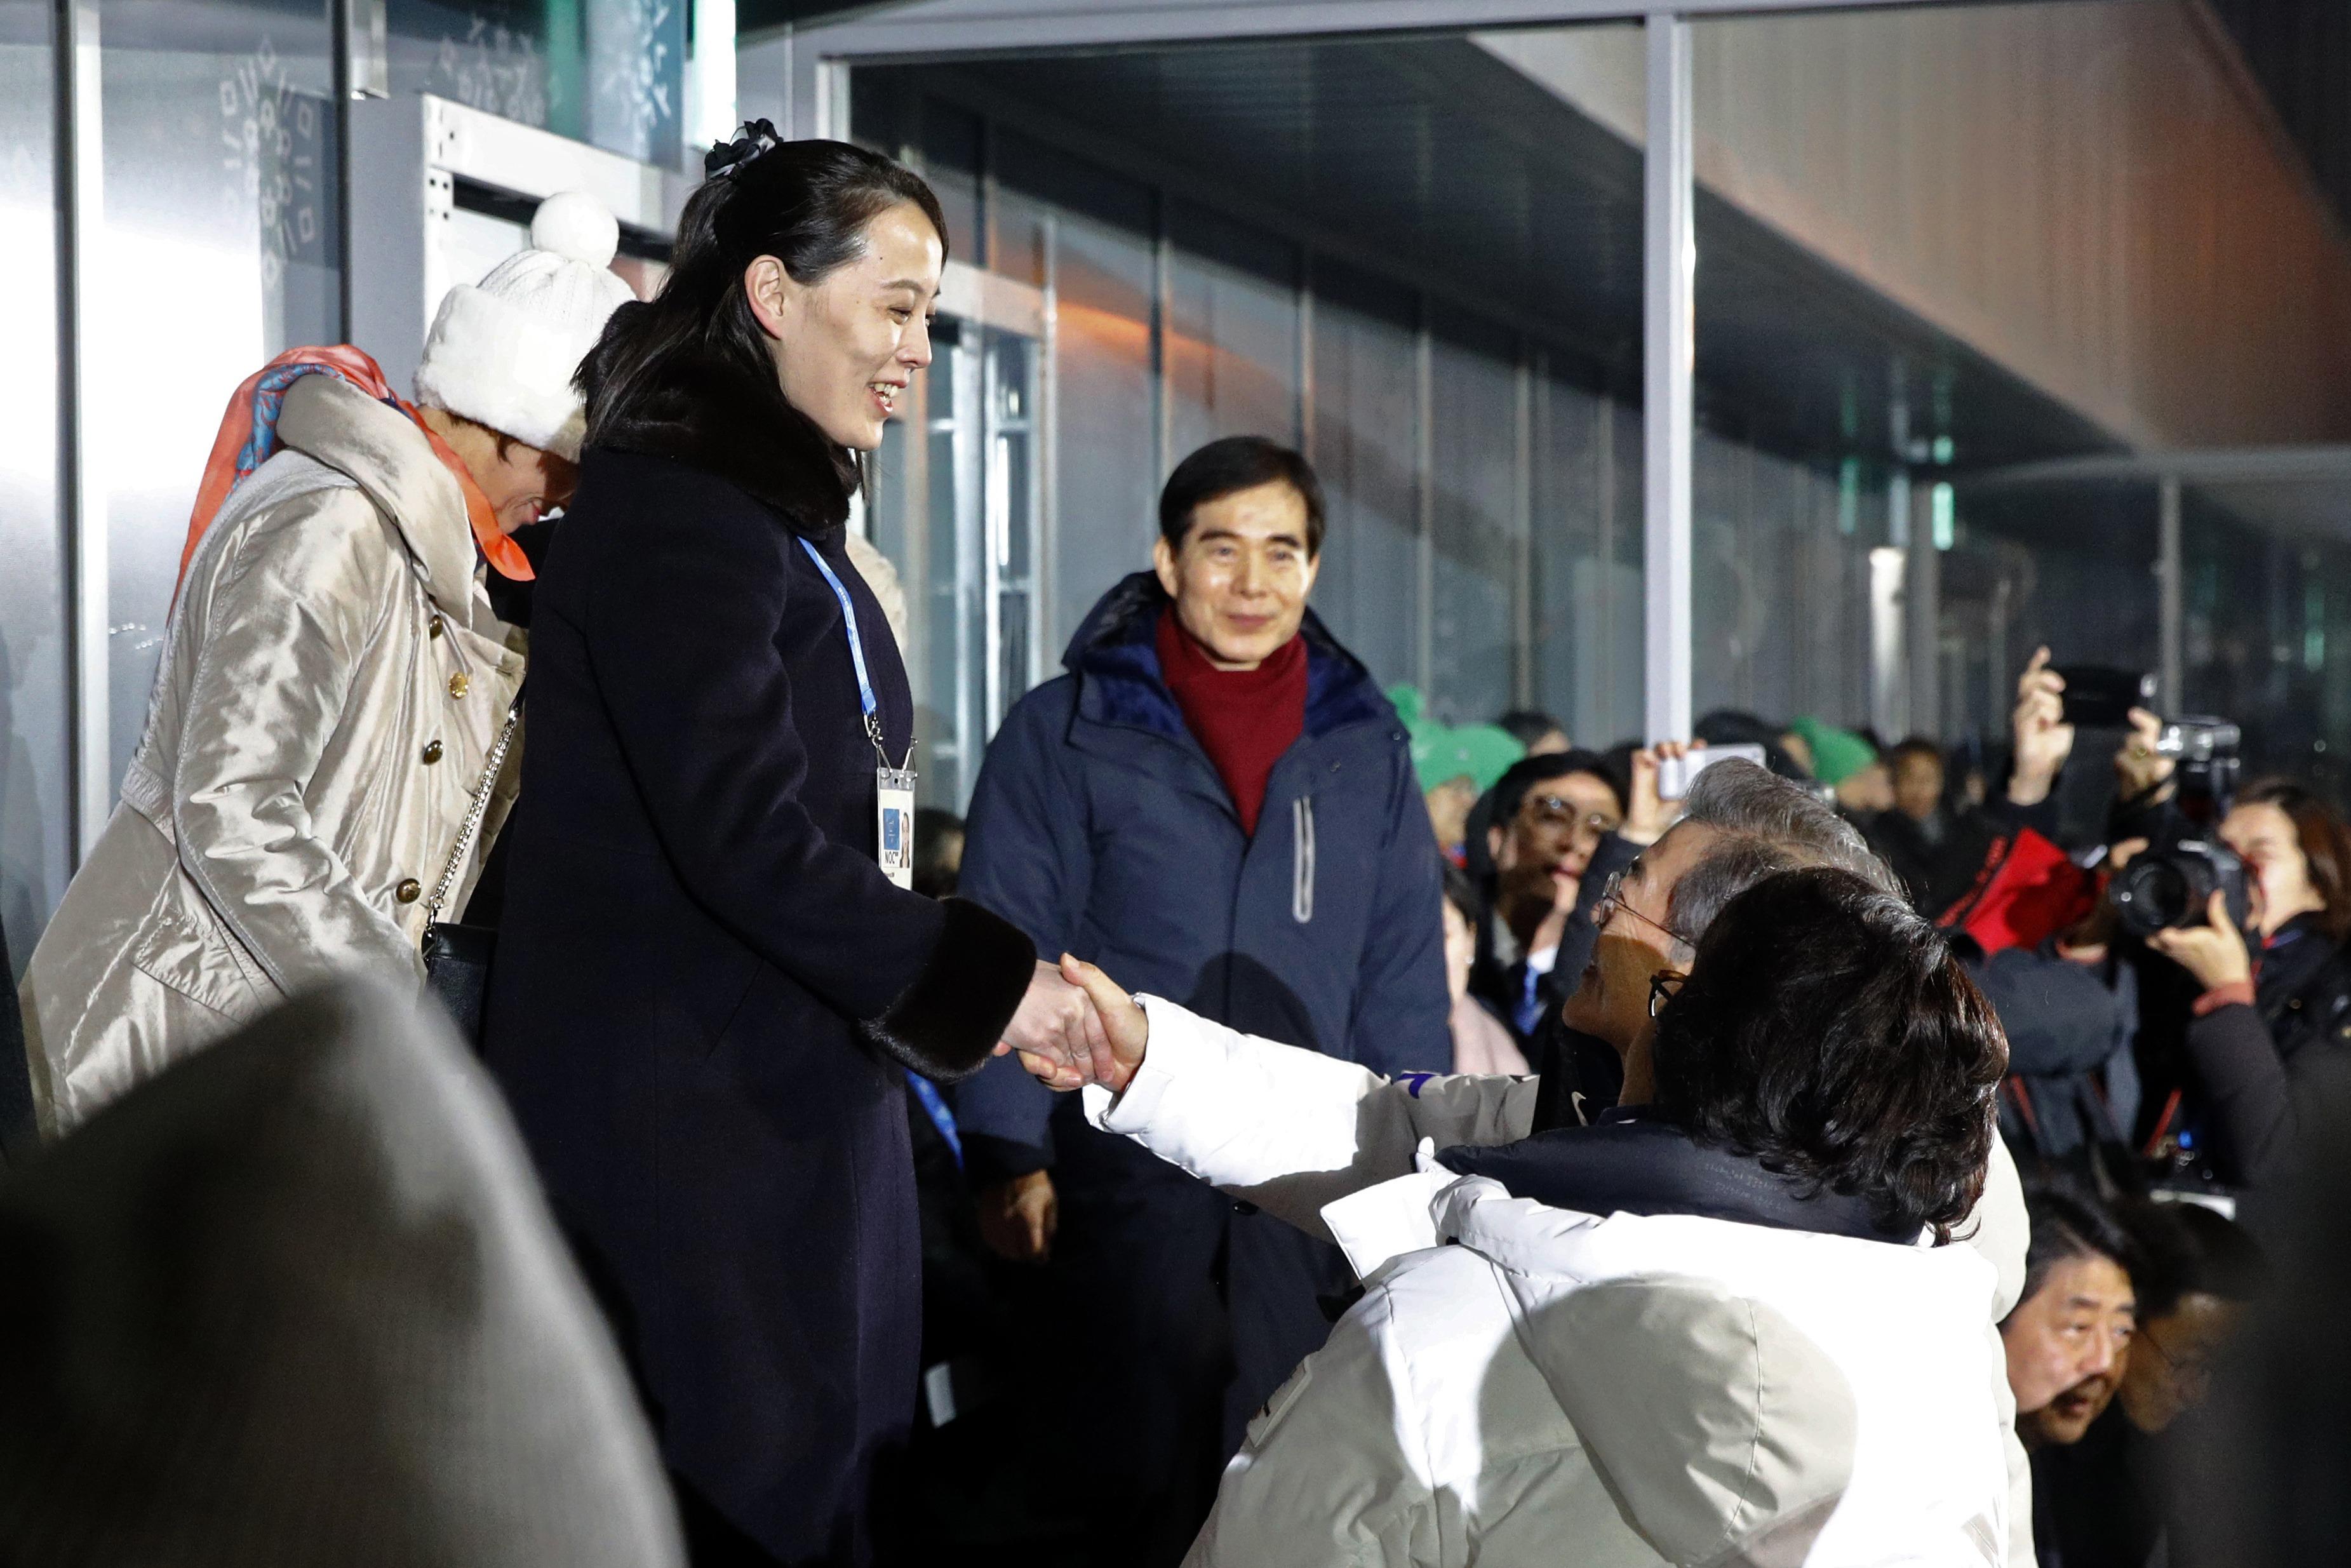 Kim Yo Jong, sister of North Korean leader Kim Jong Un, shakes hands with South Korean President Moon Jae-in.